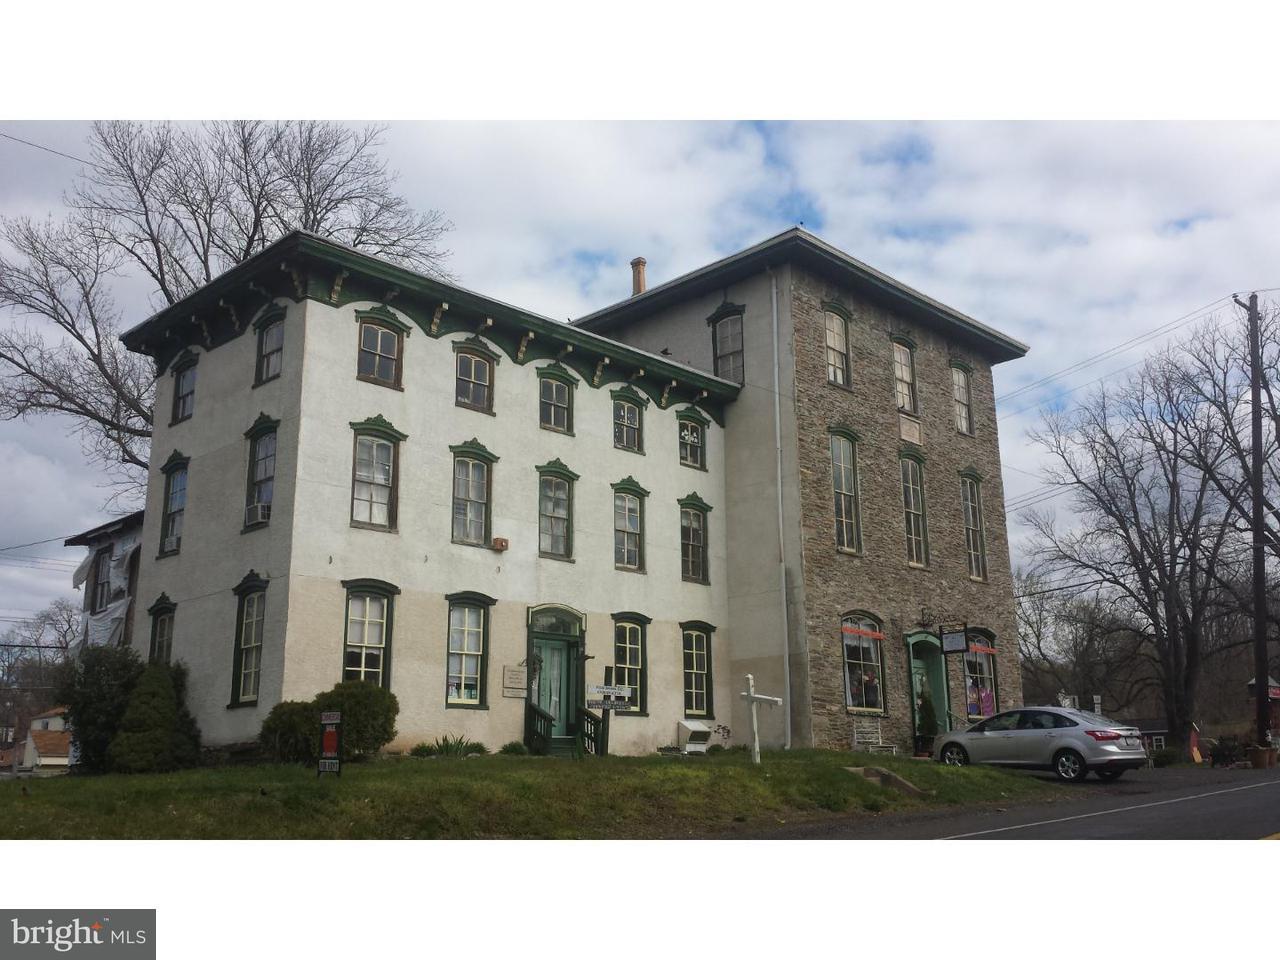 Single Family Home for Sale at 3 HULME Avenue Hulmeville, Pennsylvania 19047 United States